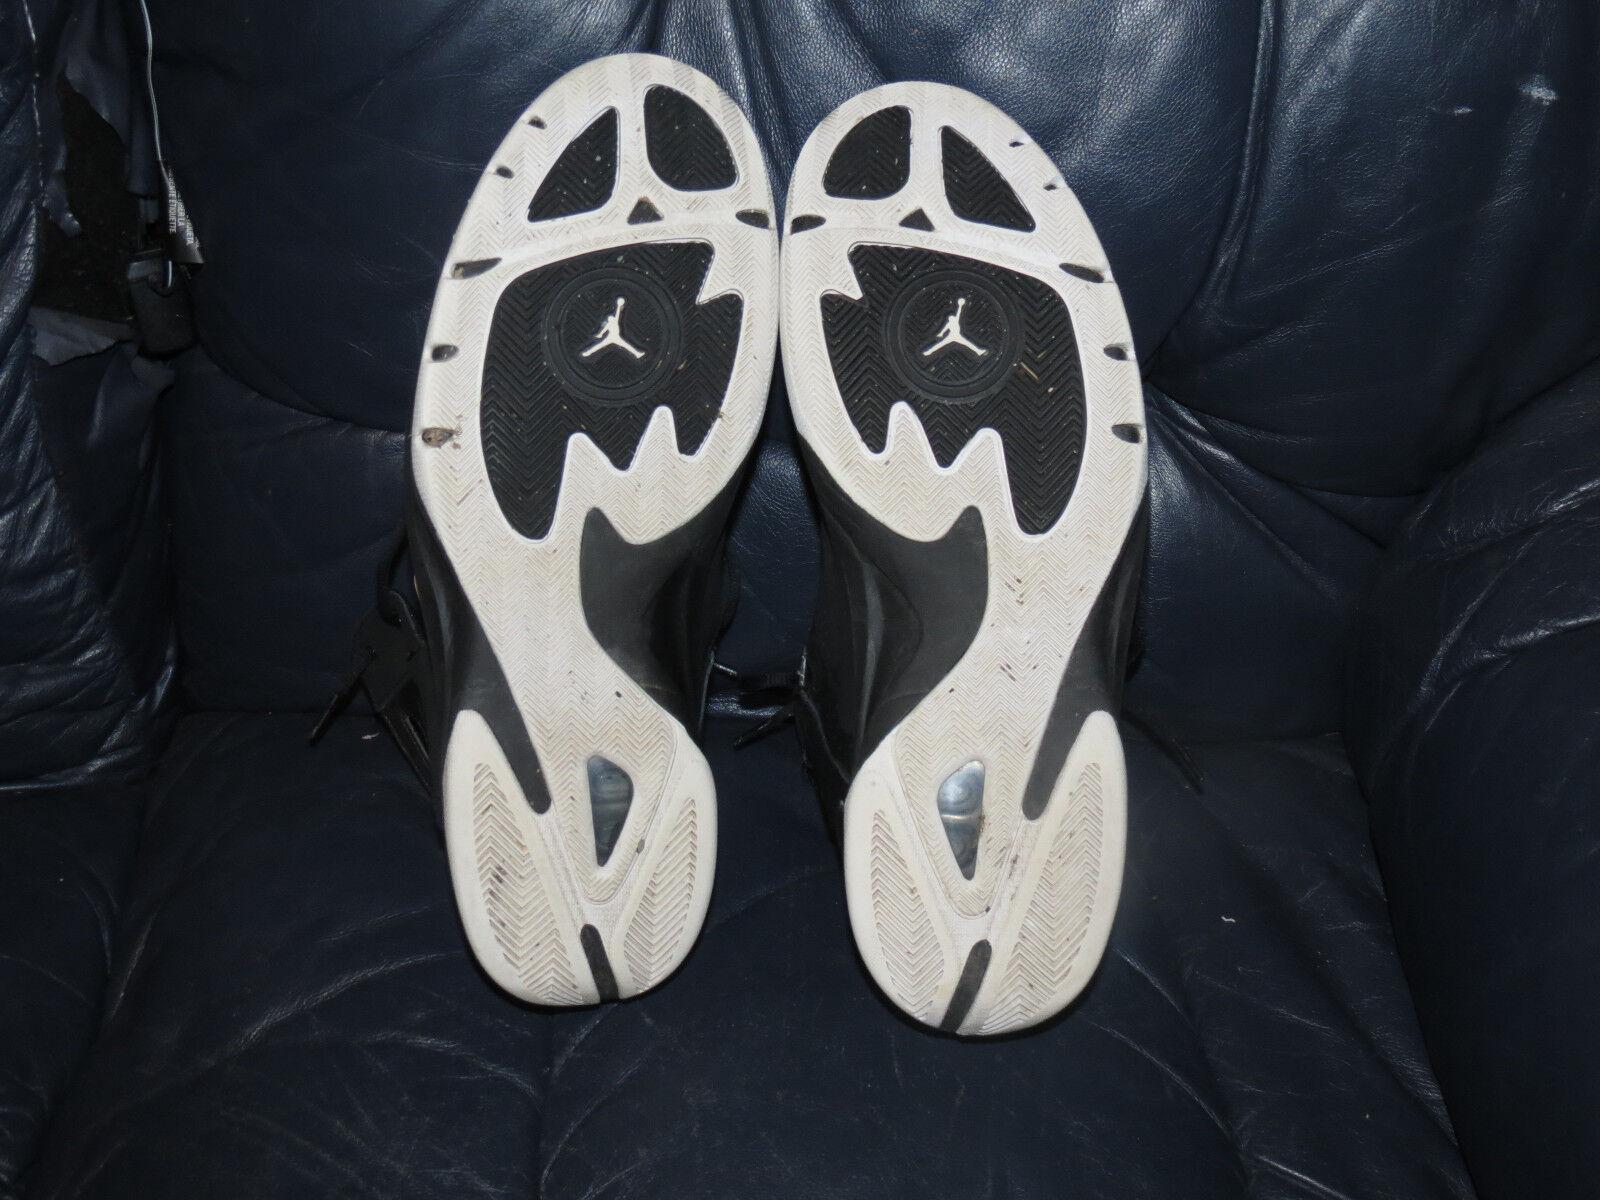 Nike Jordan Ace 23 Ii 644773-010 Aria Solo   Da Da  Basket (D M), Nuovo Sz 13 163f52